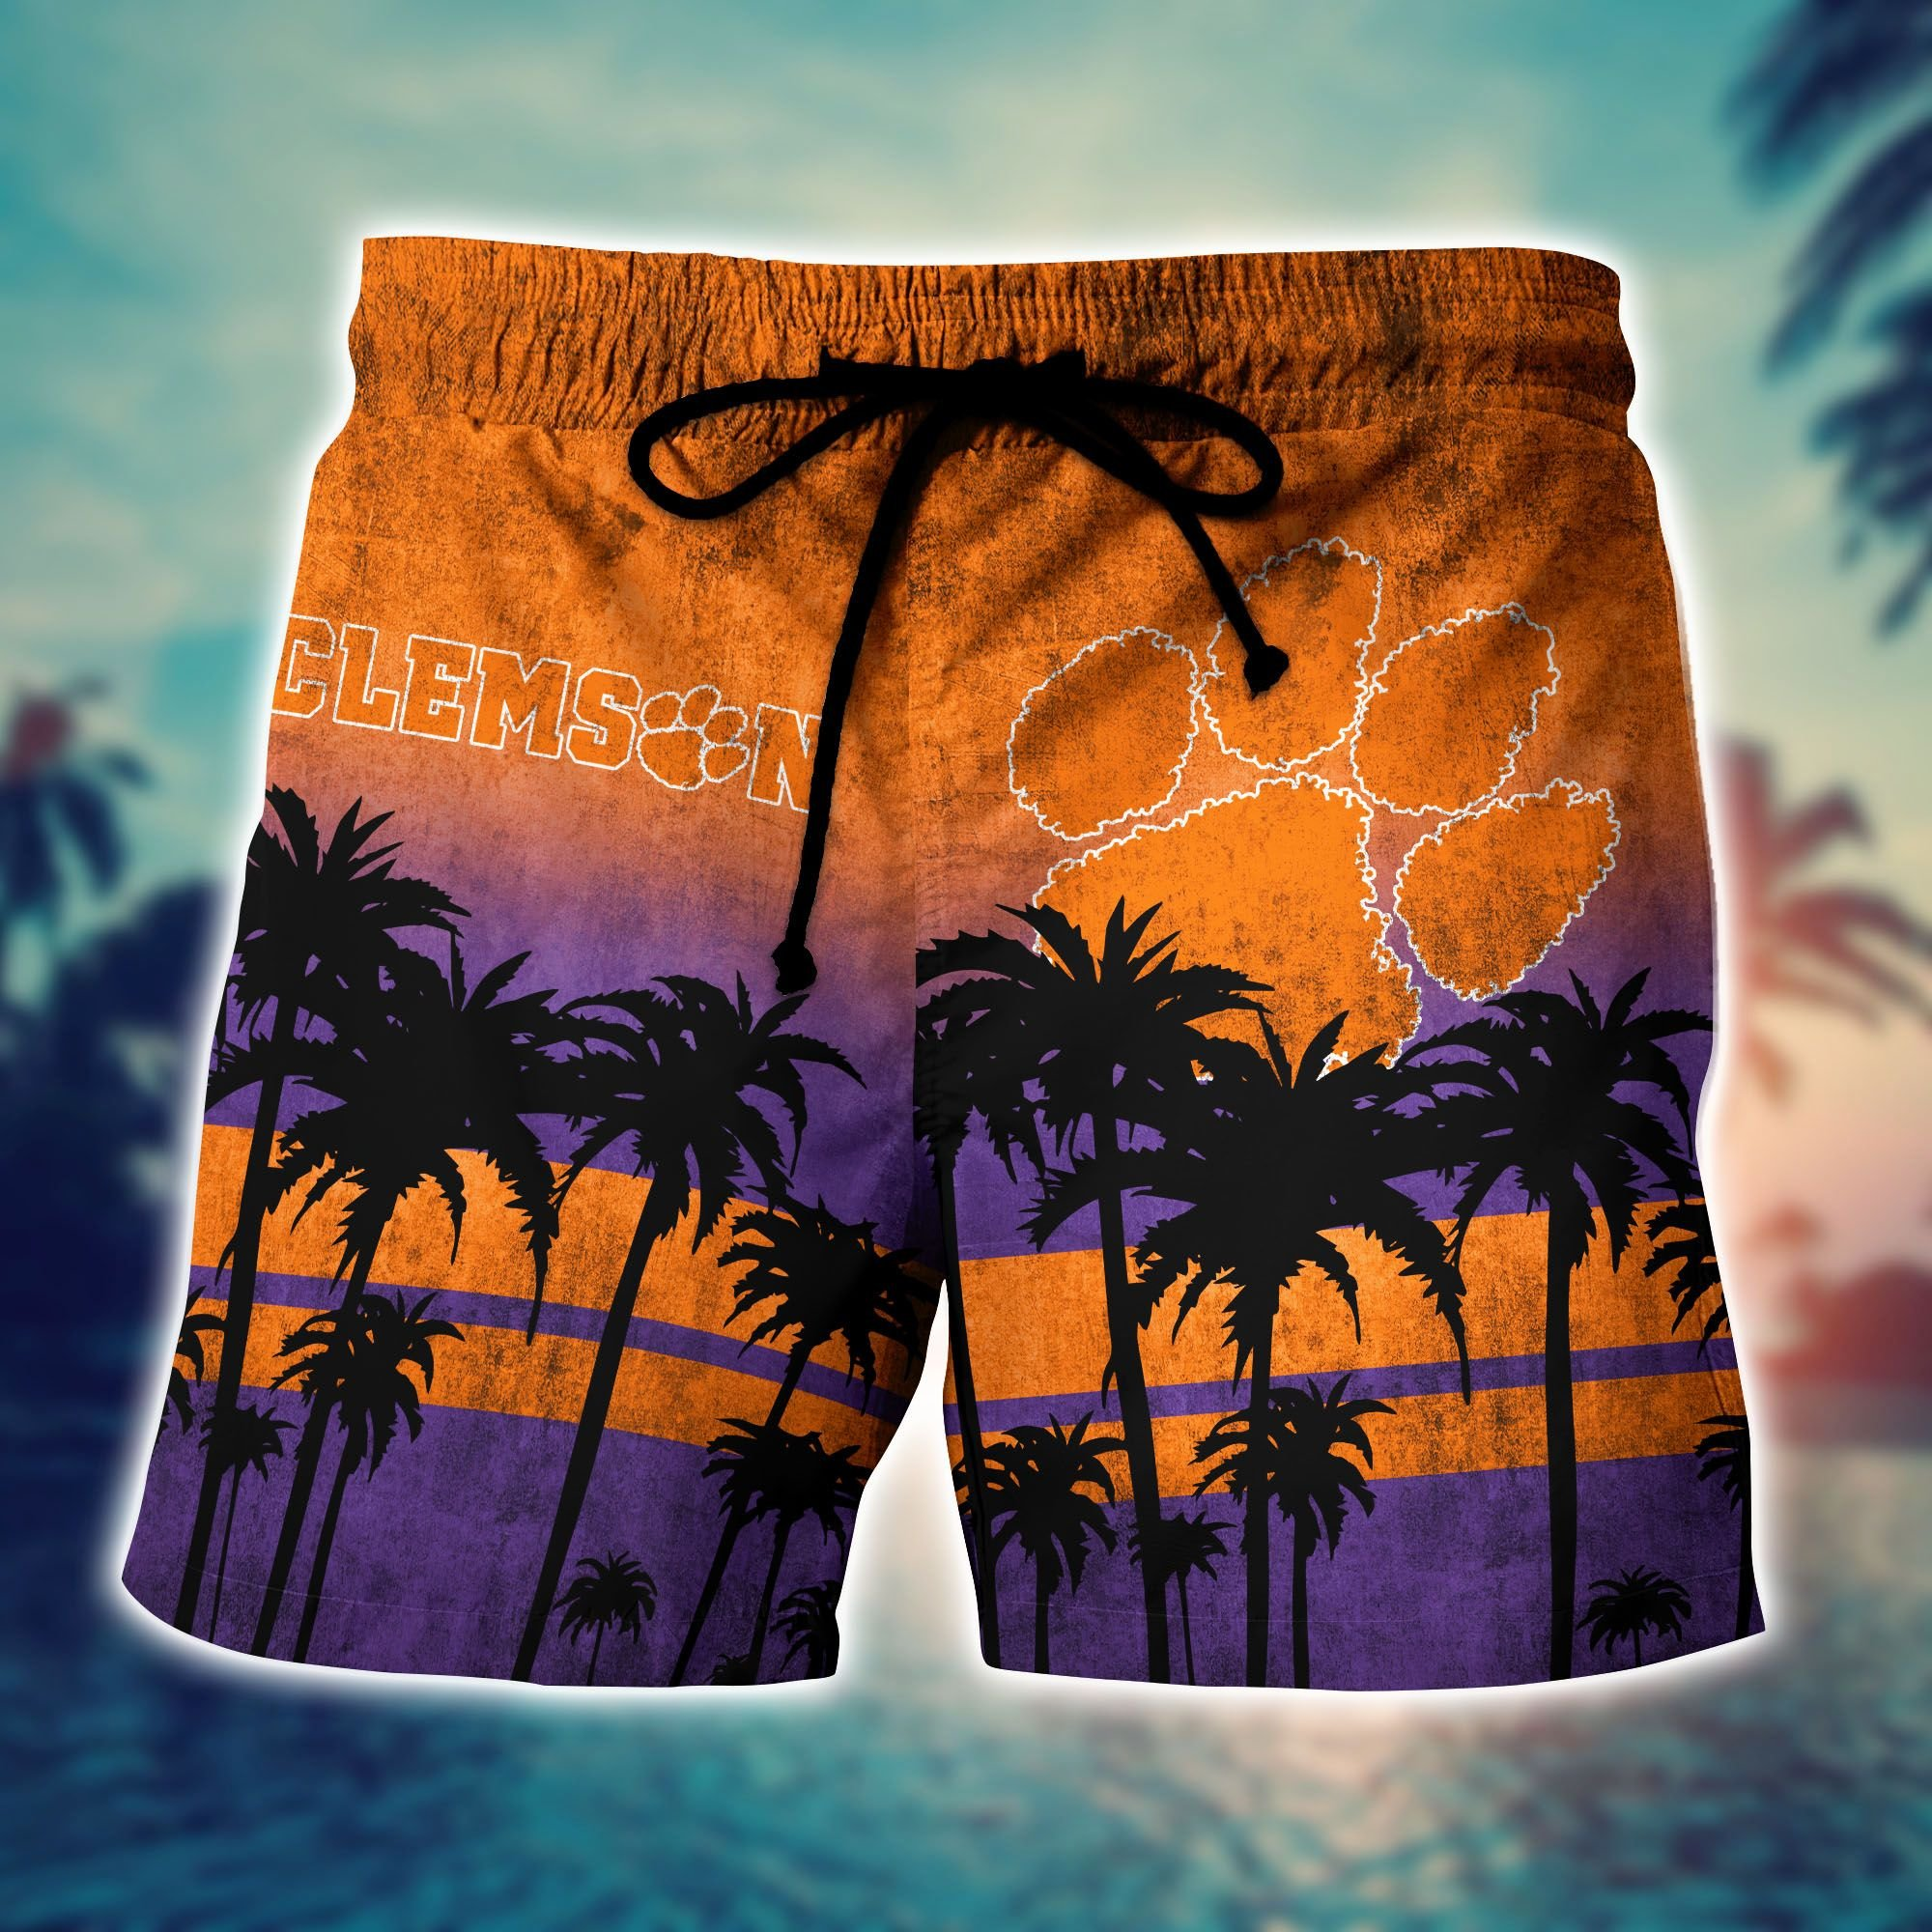 Clemson Tiger NCAA1 Hawaiian Shirt And Short - LIMITED EDITION